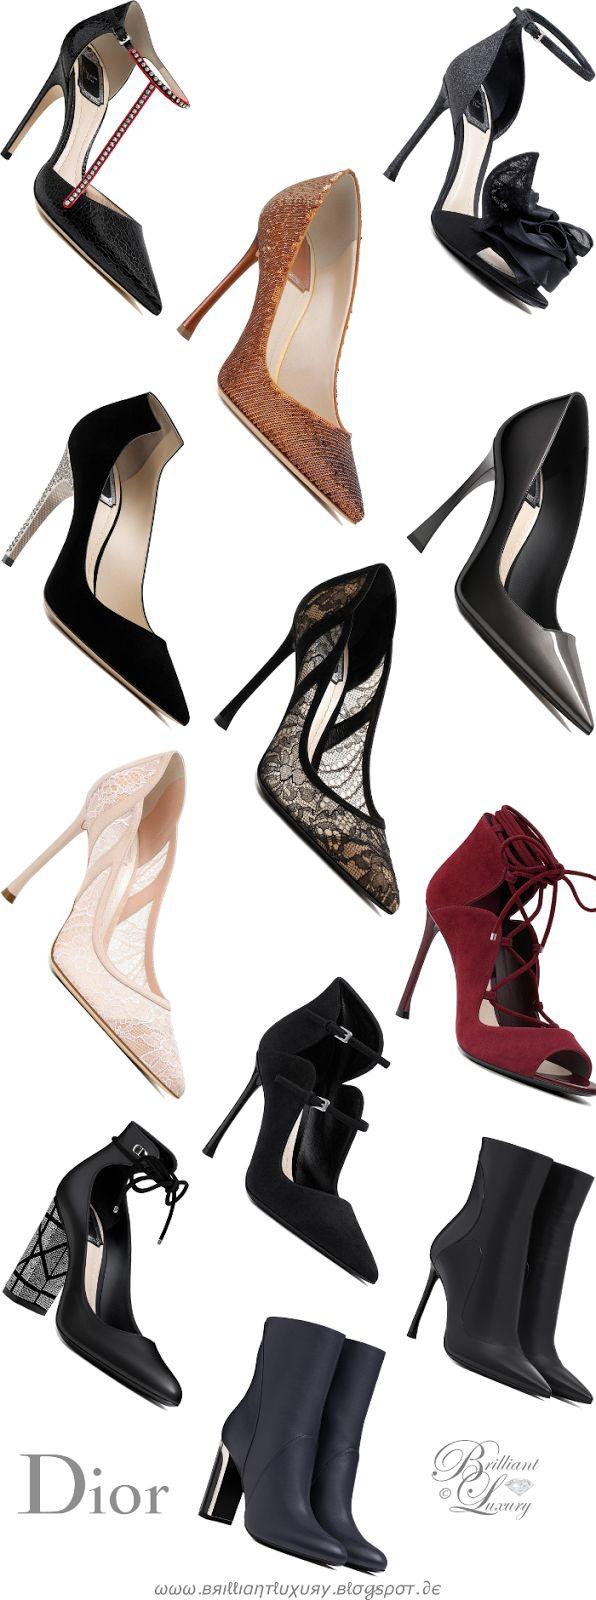 Brilliant Luxury by Emmy DE ♦Dior Shoes AW 2016